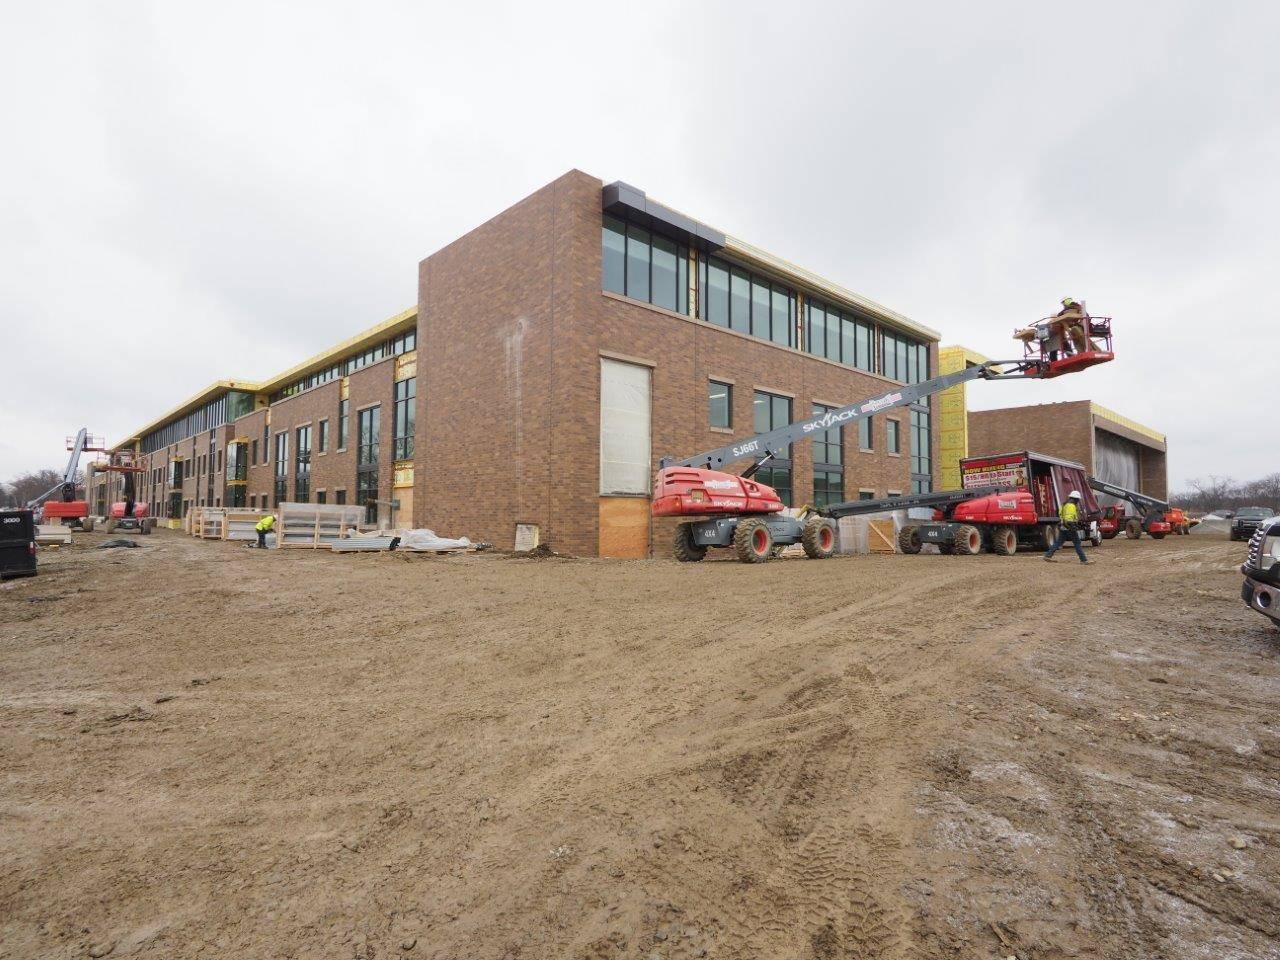 An exterior view of the new Upper Arlington High School